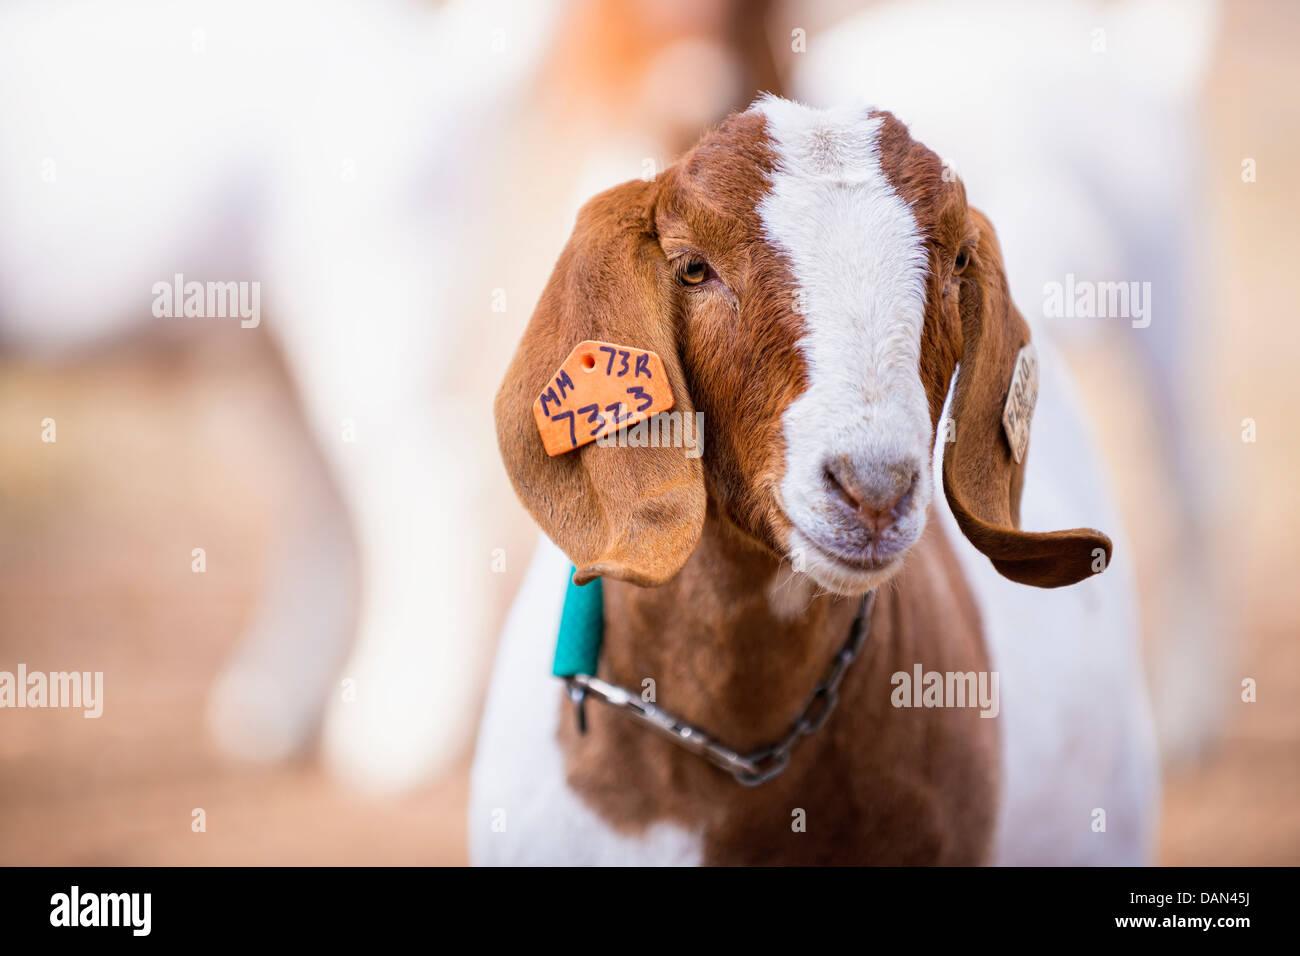 Close Up Image Goat Stockfotos & Close Up Image Goat Bilder - Seite ...